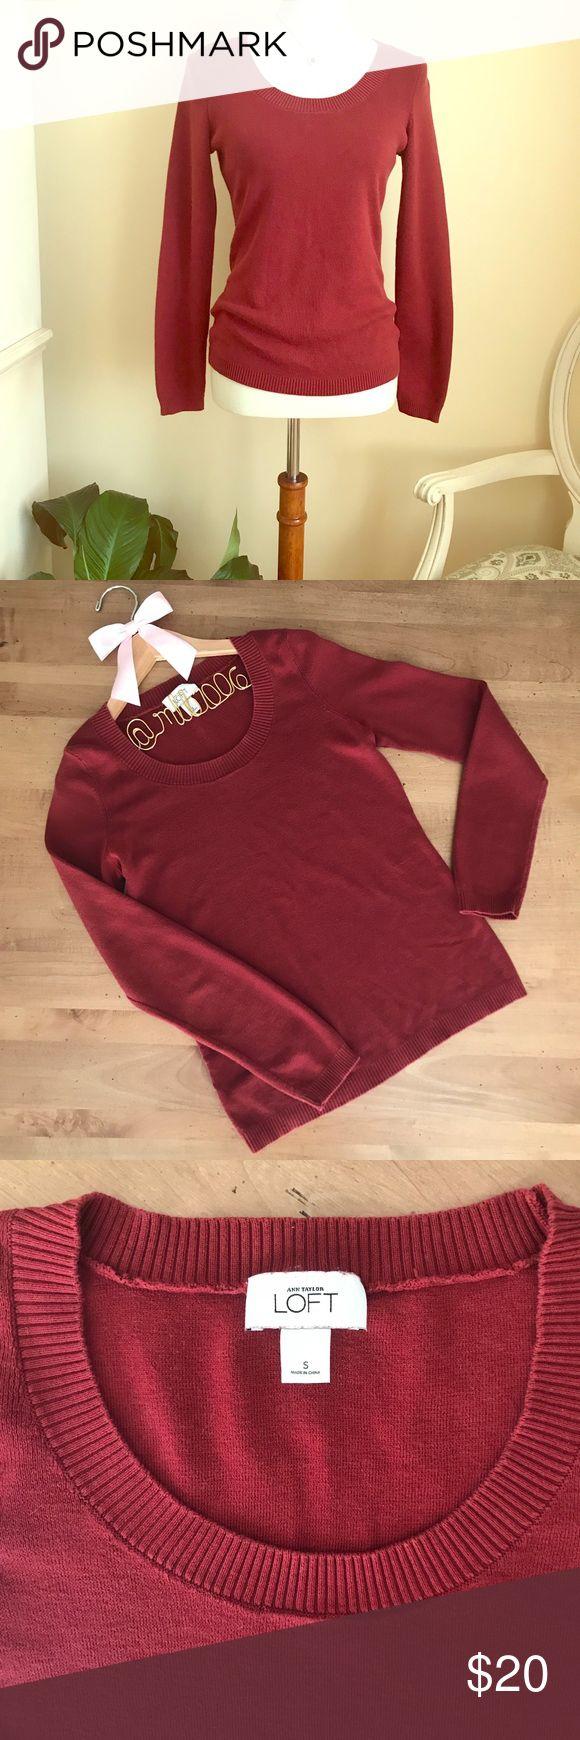 Anne Taylor LOFT Scoop Neck Burgundy Sweater Anne Taylor LOFT Scoop Neck Burgundy Sweater. 100% Pima Cotton. EUC. LOFT Sweaters Crew & Scoop Necks